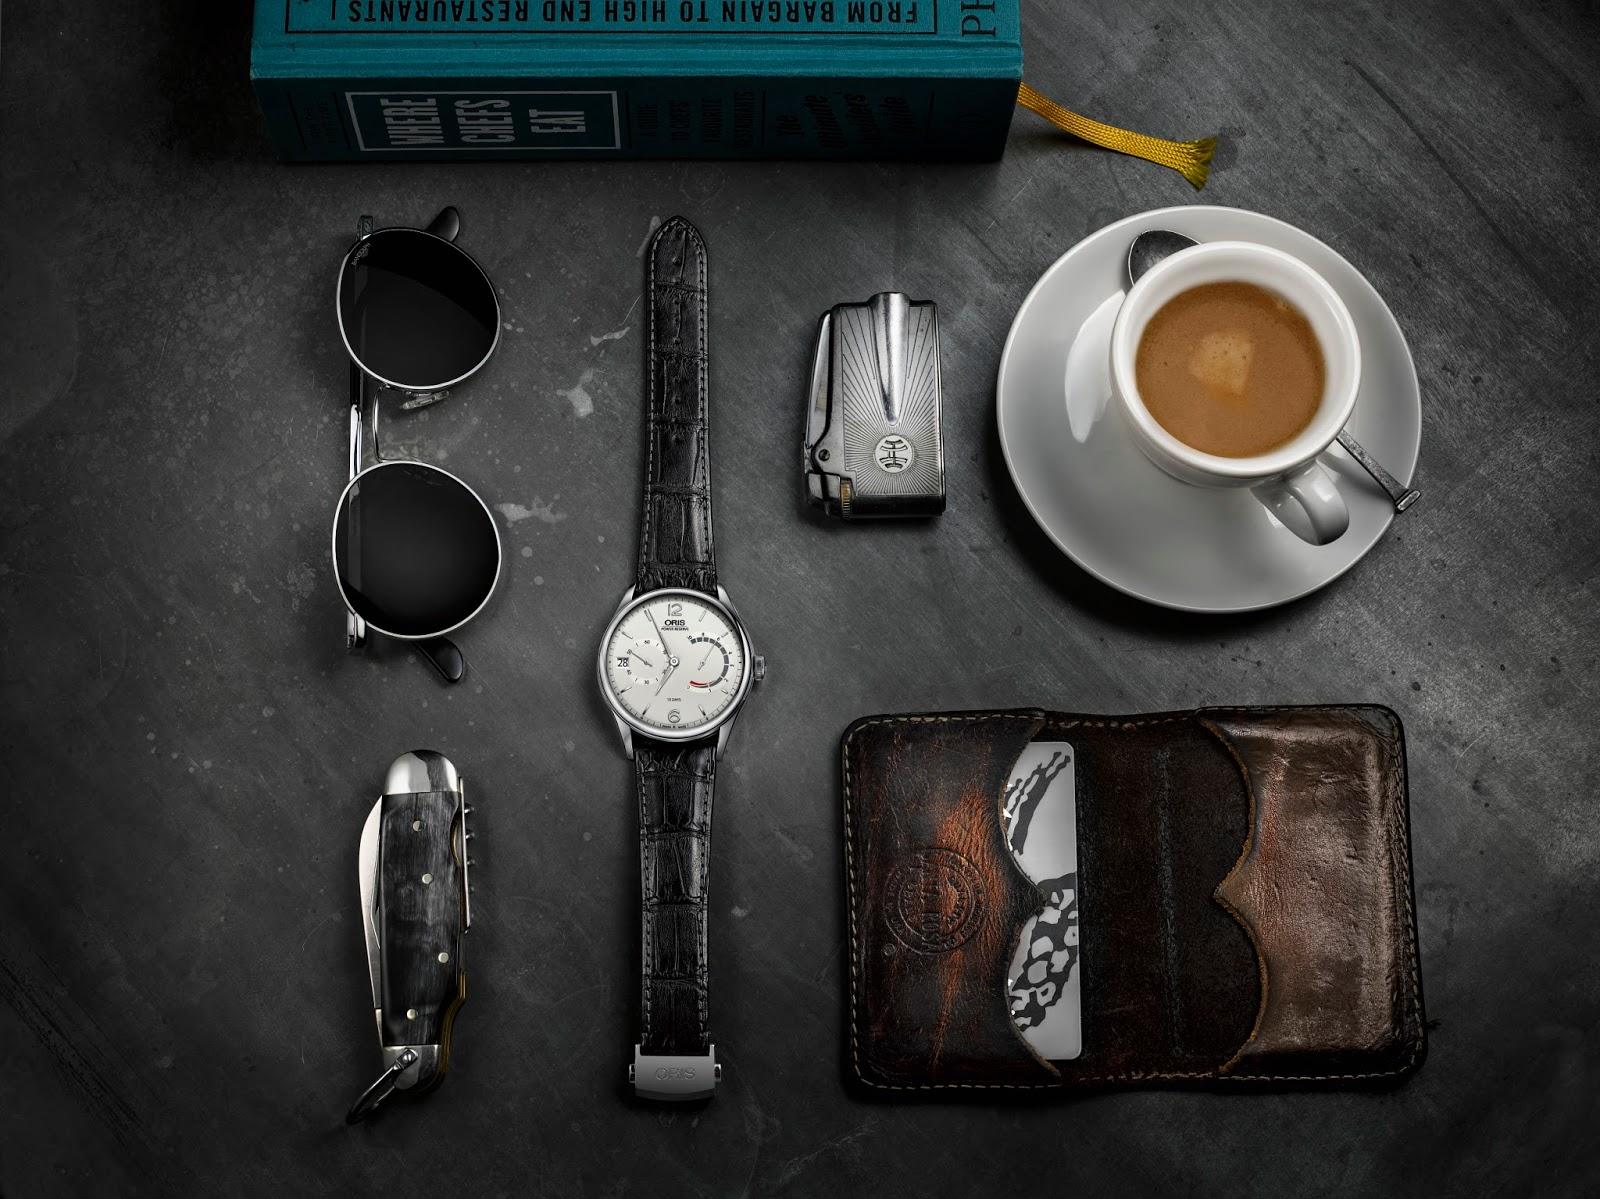 oris-artelier-calibre-111, oris-artelier; calibre-111, oris-artelier-calibre-110, calibre-110, montre-oris, artelier-calibre-111, artelier-calibre-110, dudessinauxpodiums, du-dessin-aux-podiums, oris, Oris-Artelier-Calibre-mens-watch, mens-watch, montre-homme